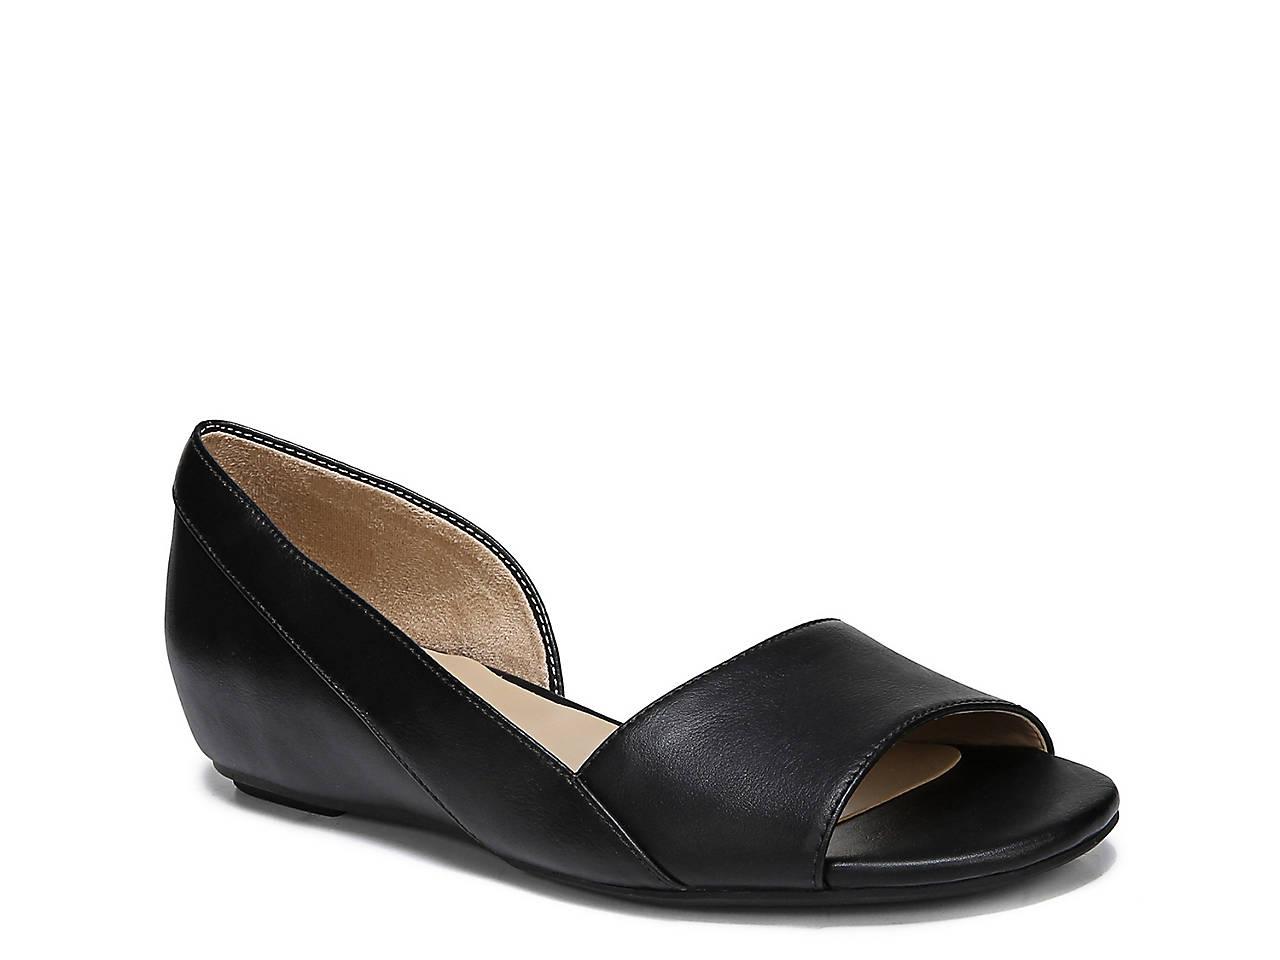 ab68383cef Naturalizer Roma Flat Women's Shoes | DSW